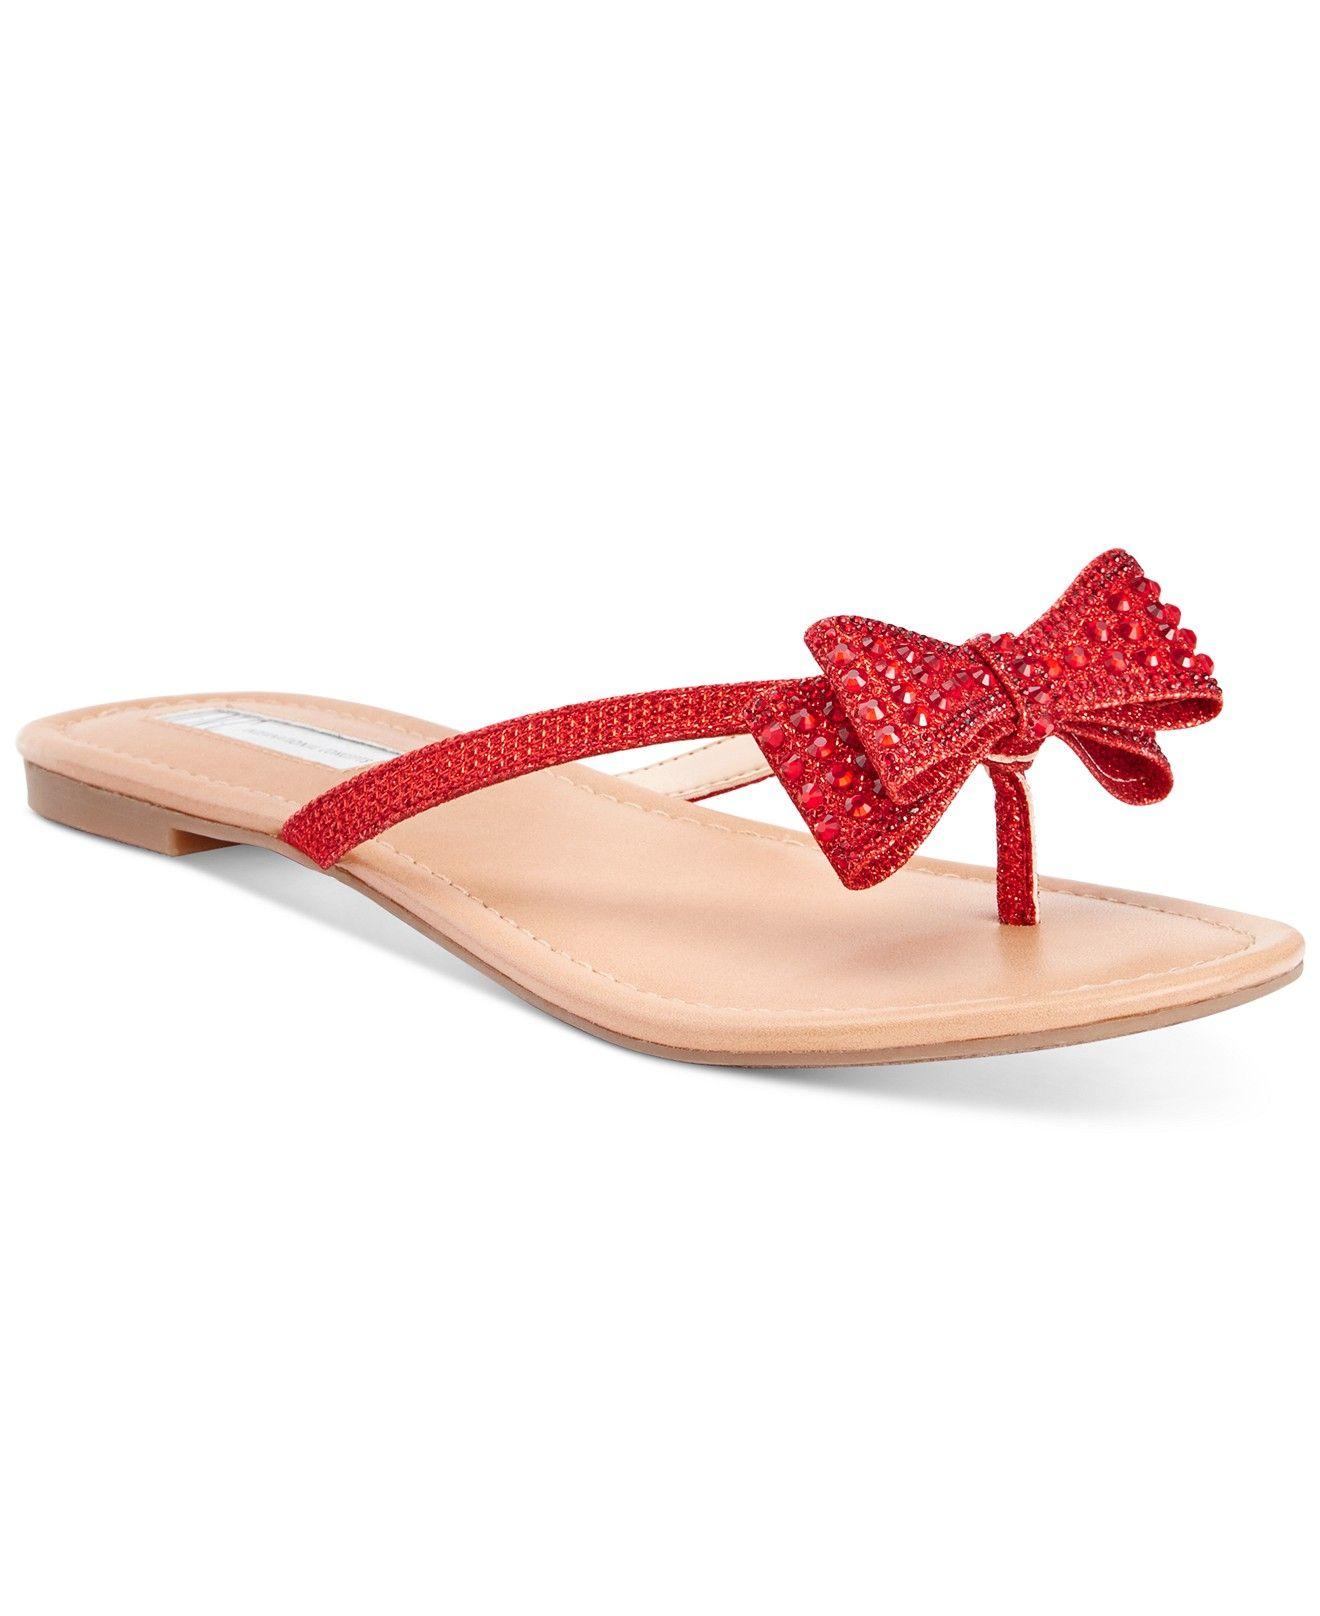 e43c23ba6db87c INC International Concepts Women s Malissa Flat Thong Sandals